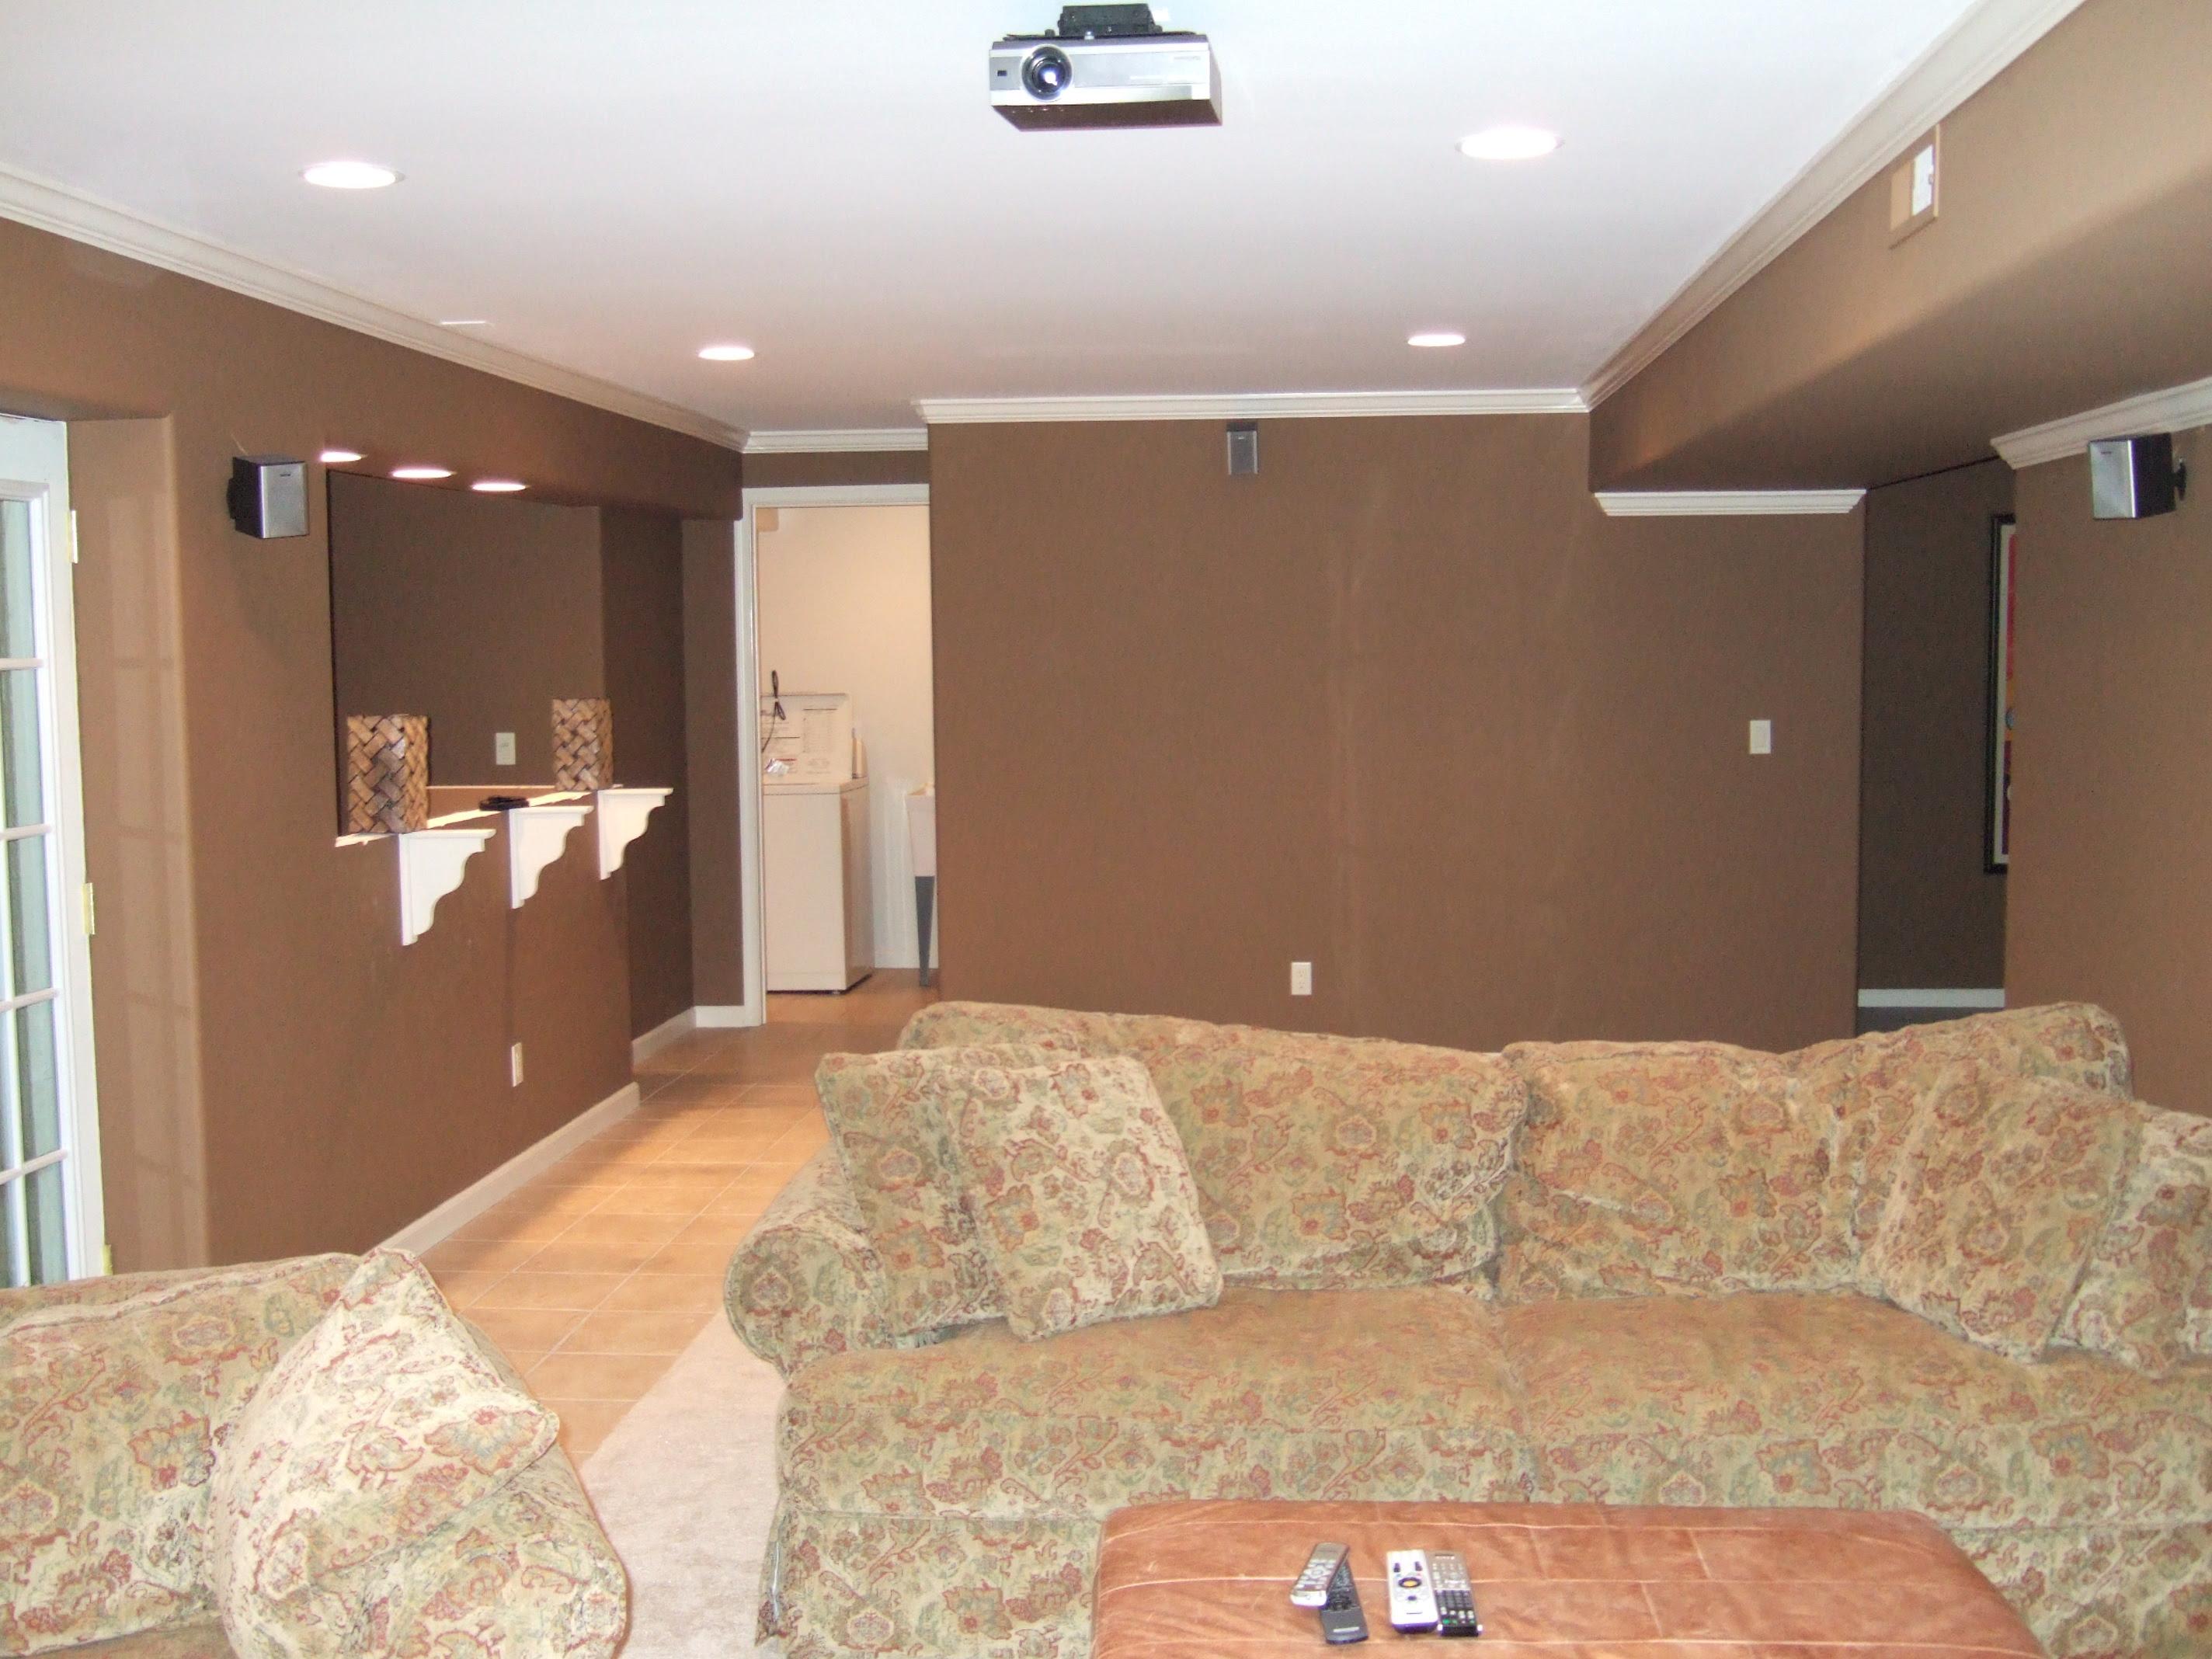 bathroom design center denver co home decorating ideasbathroom interior design